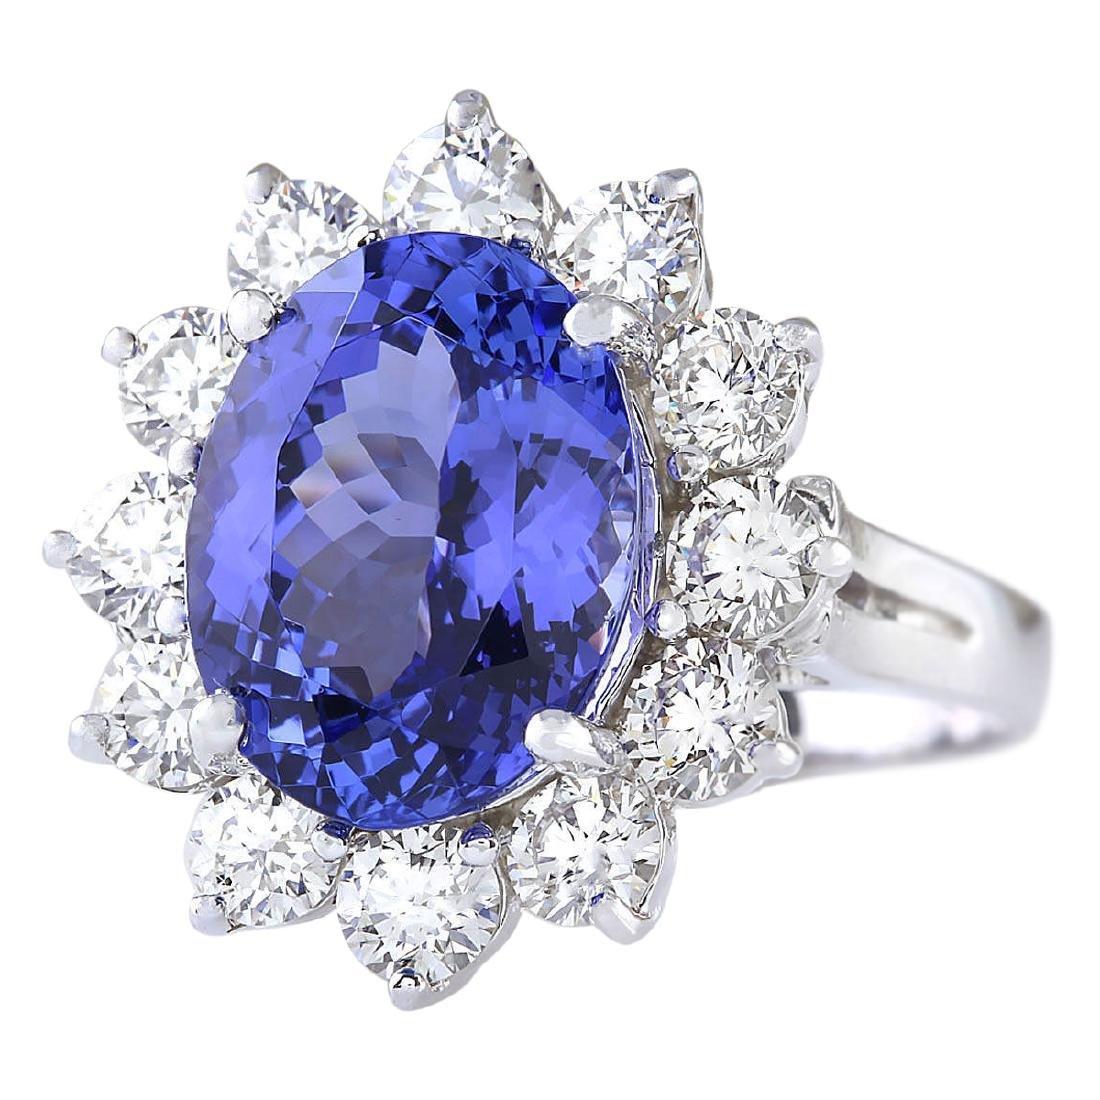 6.78 CTW Natural Blue Tanzanite And Diamond Ring 18K - 2